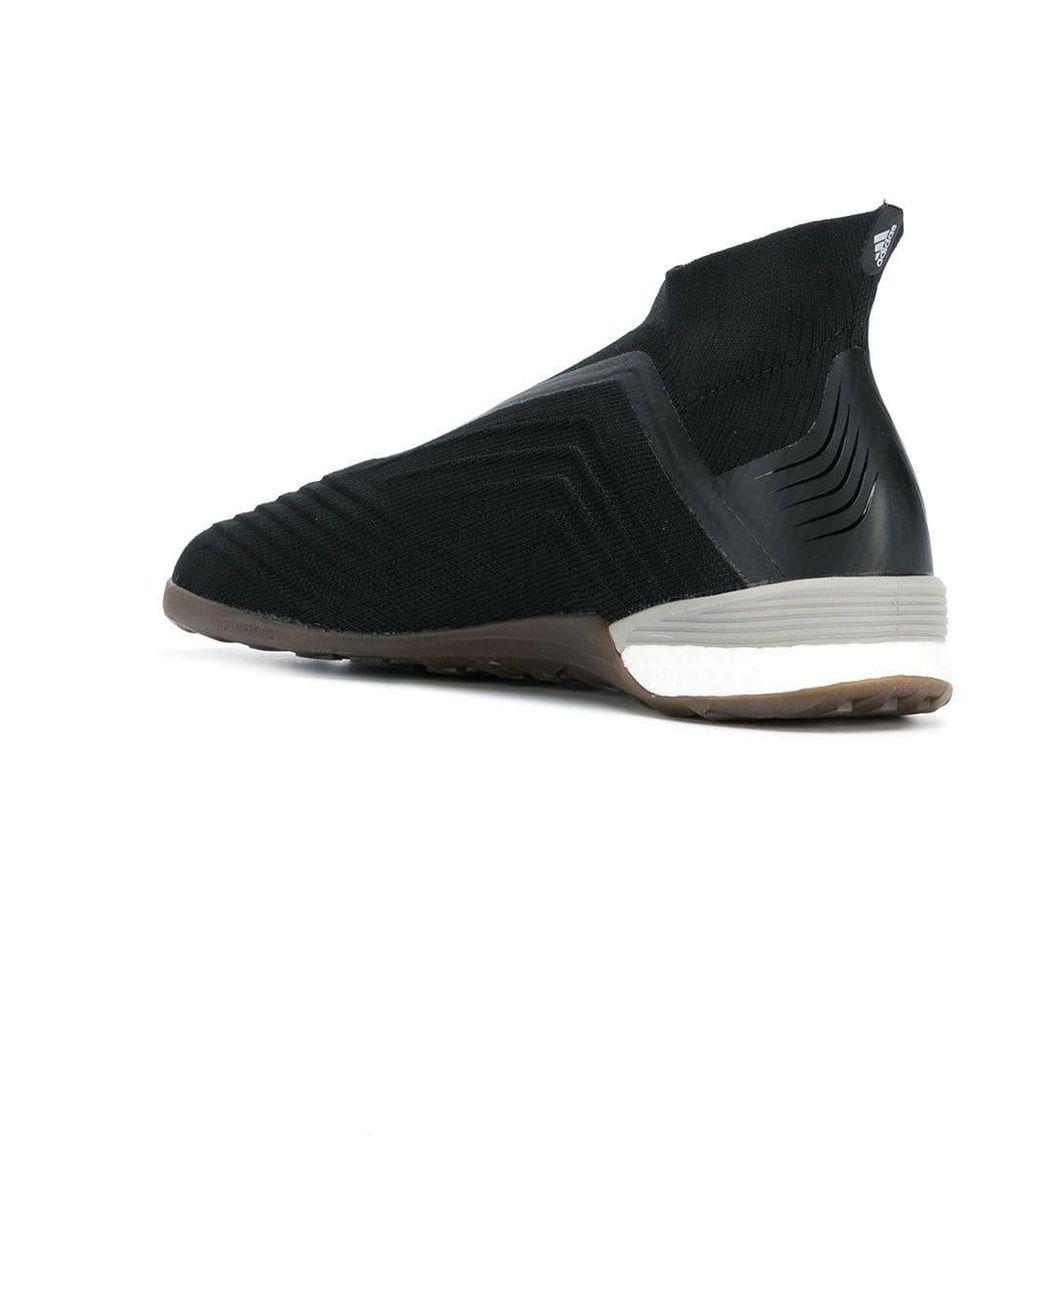 online store cd9c1 aeb45 Men's Black X Adidas Predator Sneakers